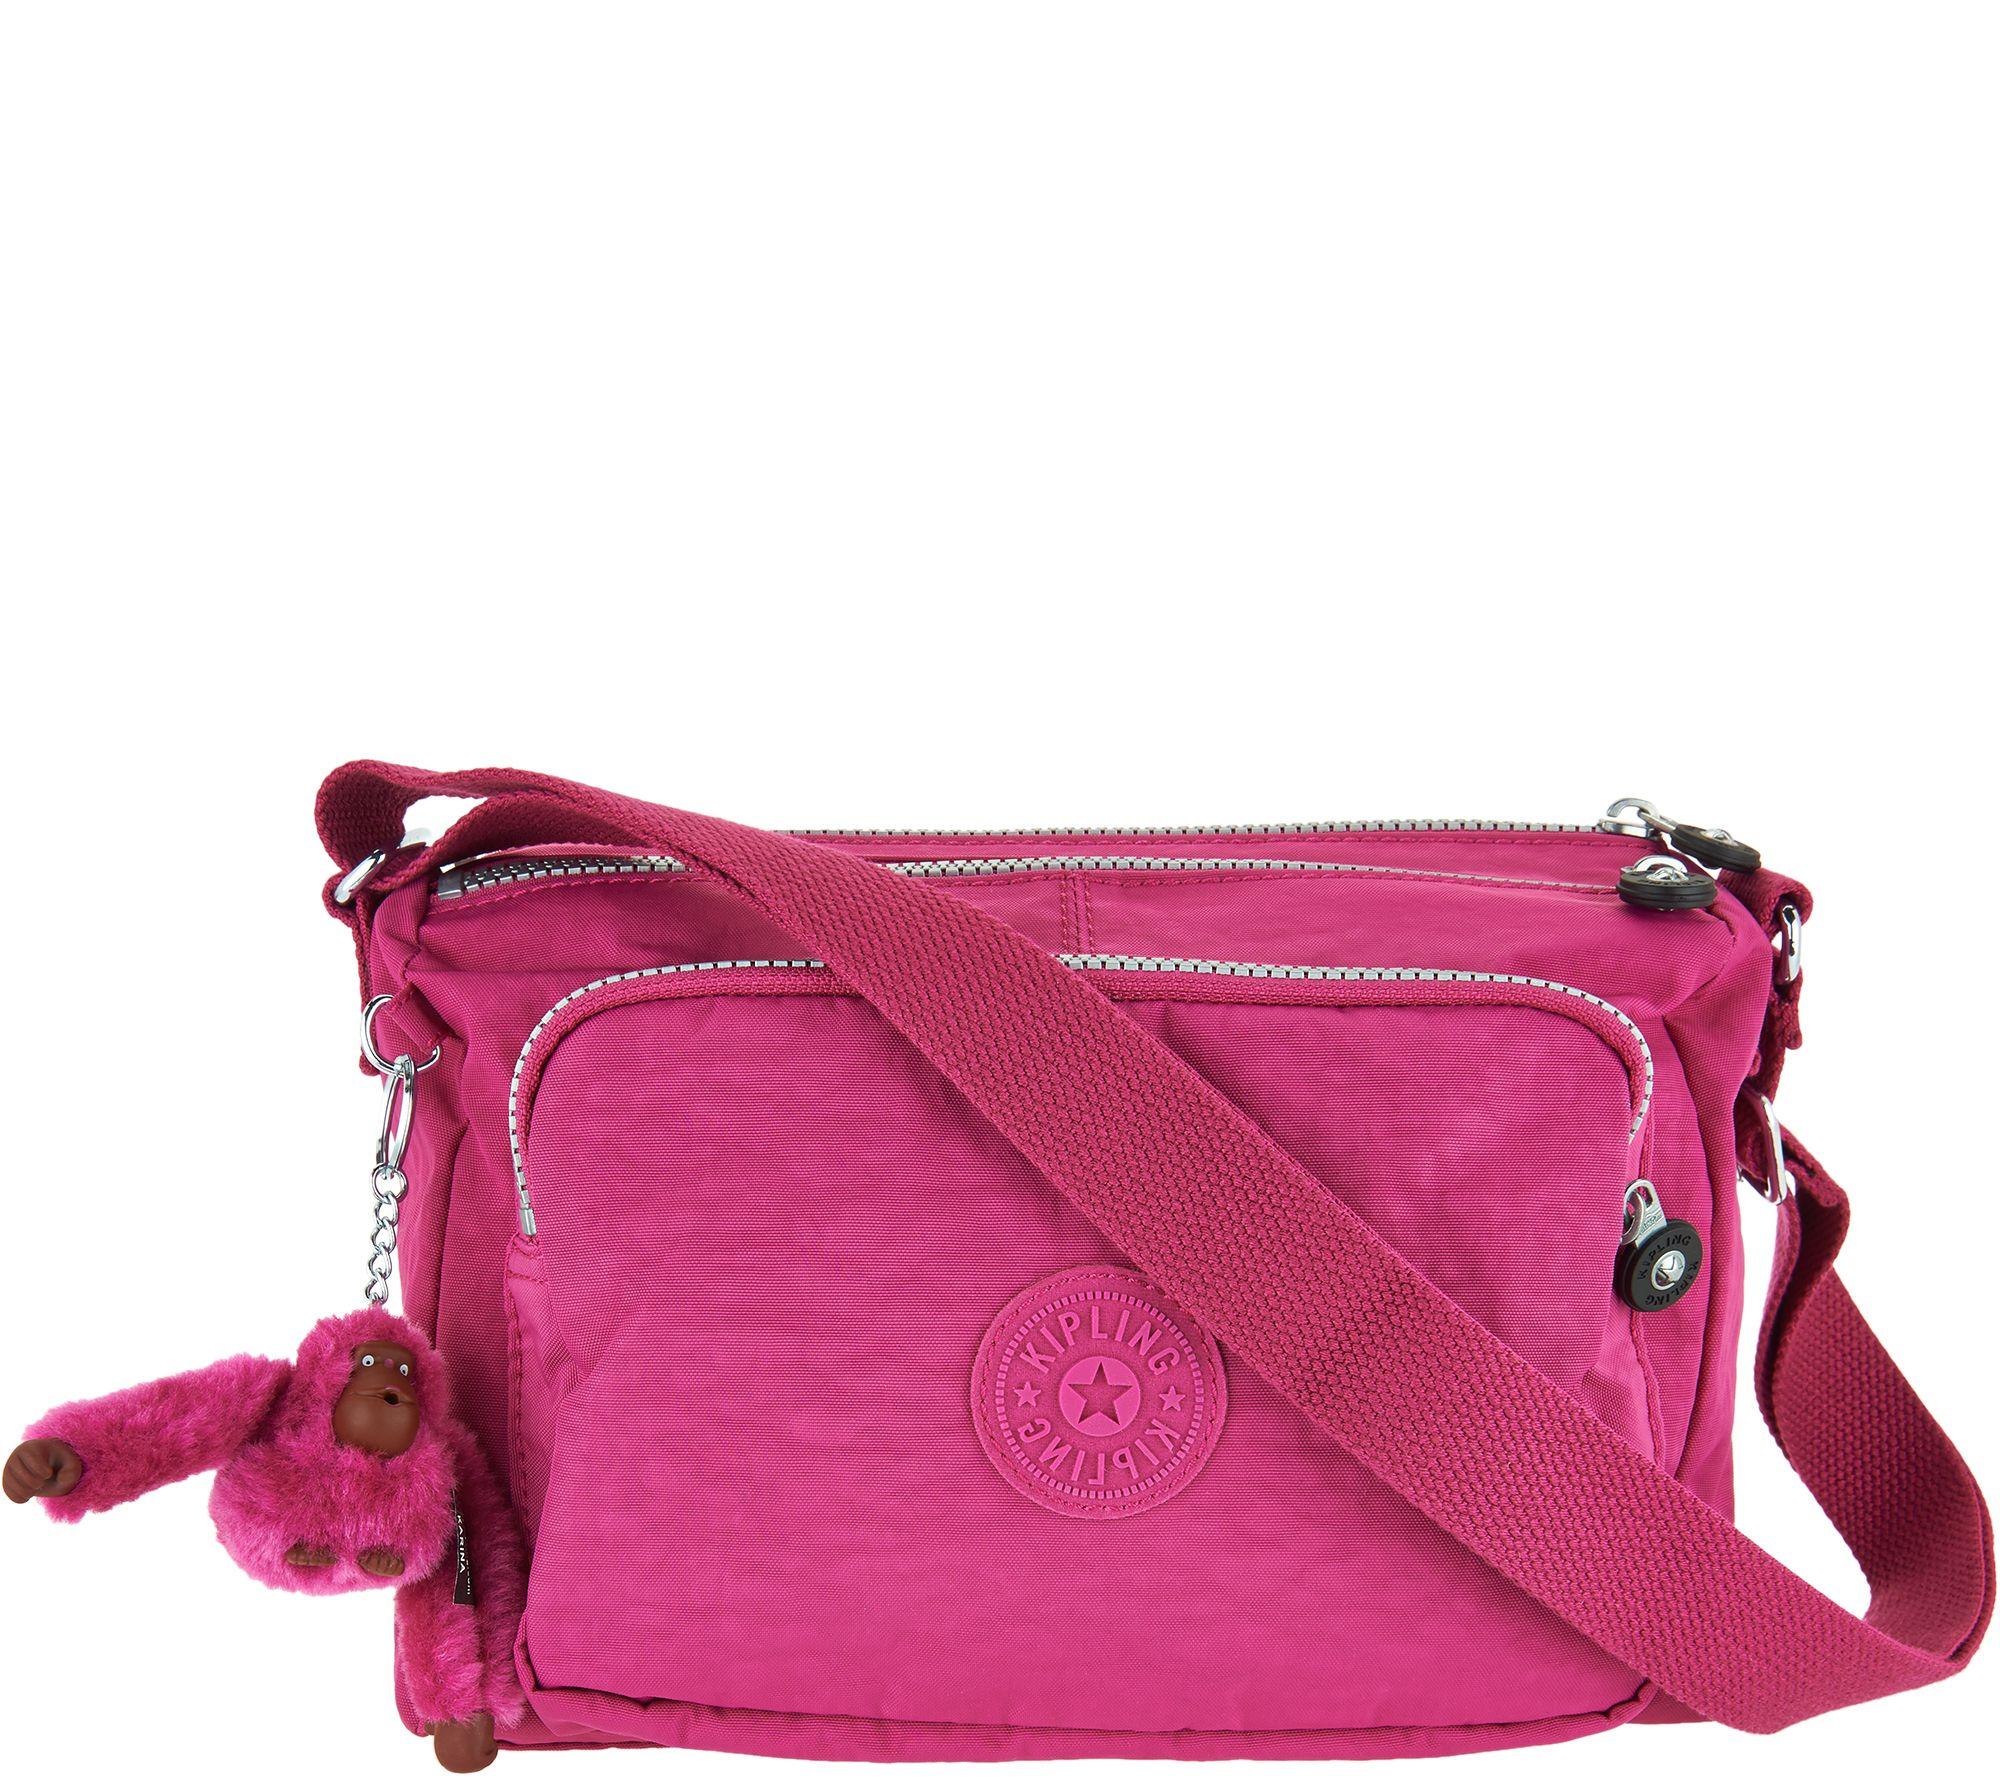 8b352c886e6 Kipling Adjustable Shoulder Bag - Reth - Page 1 — QVC.com